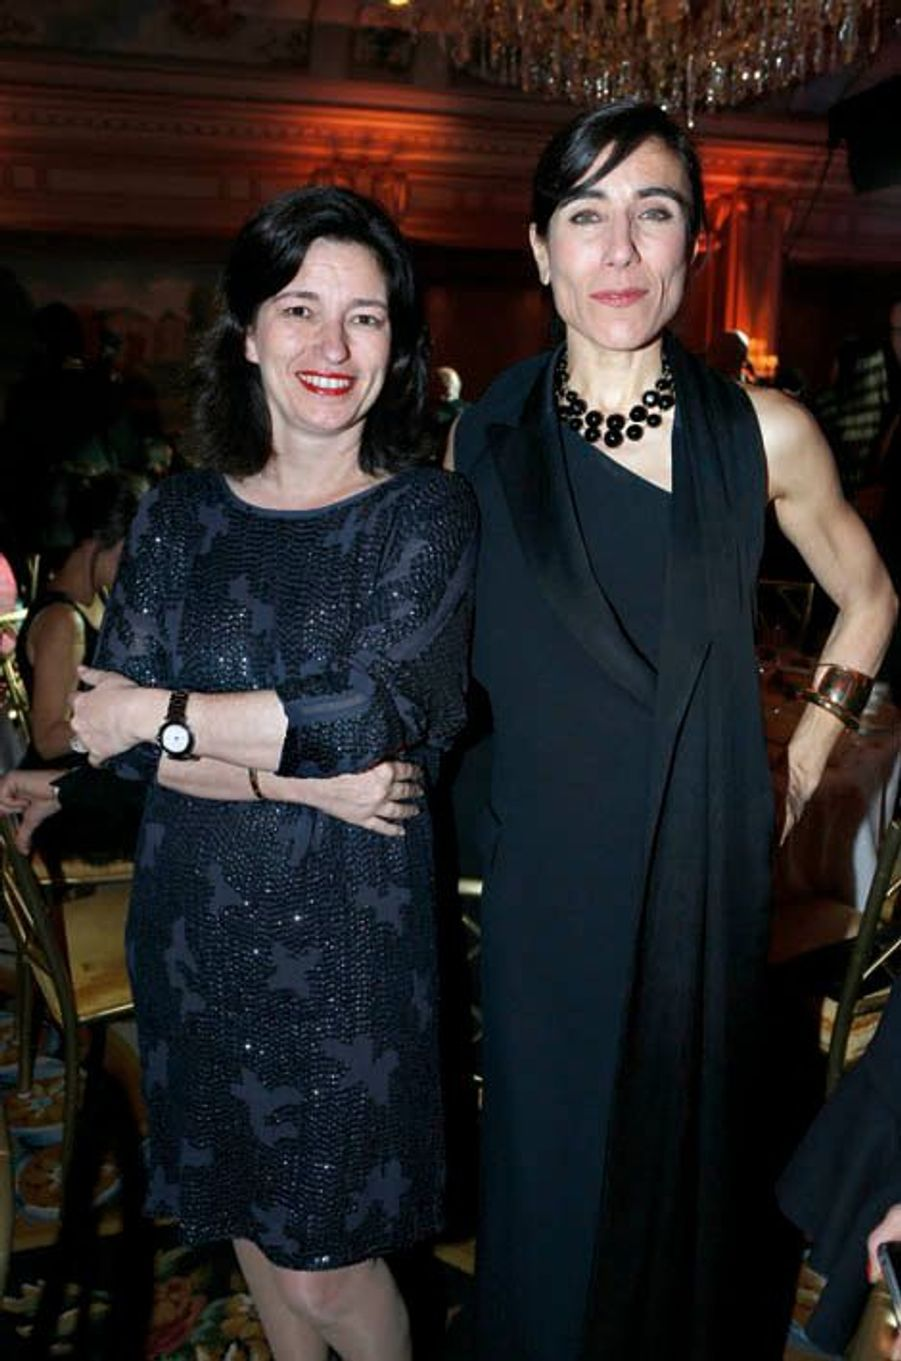 La présidente de Gerard Darel, Marianne Romestain, fan de danse, et la chorégraphe Blanca Li.